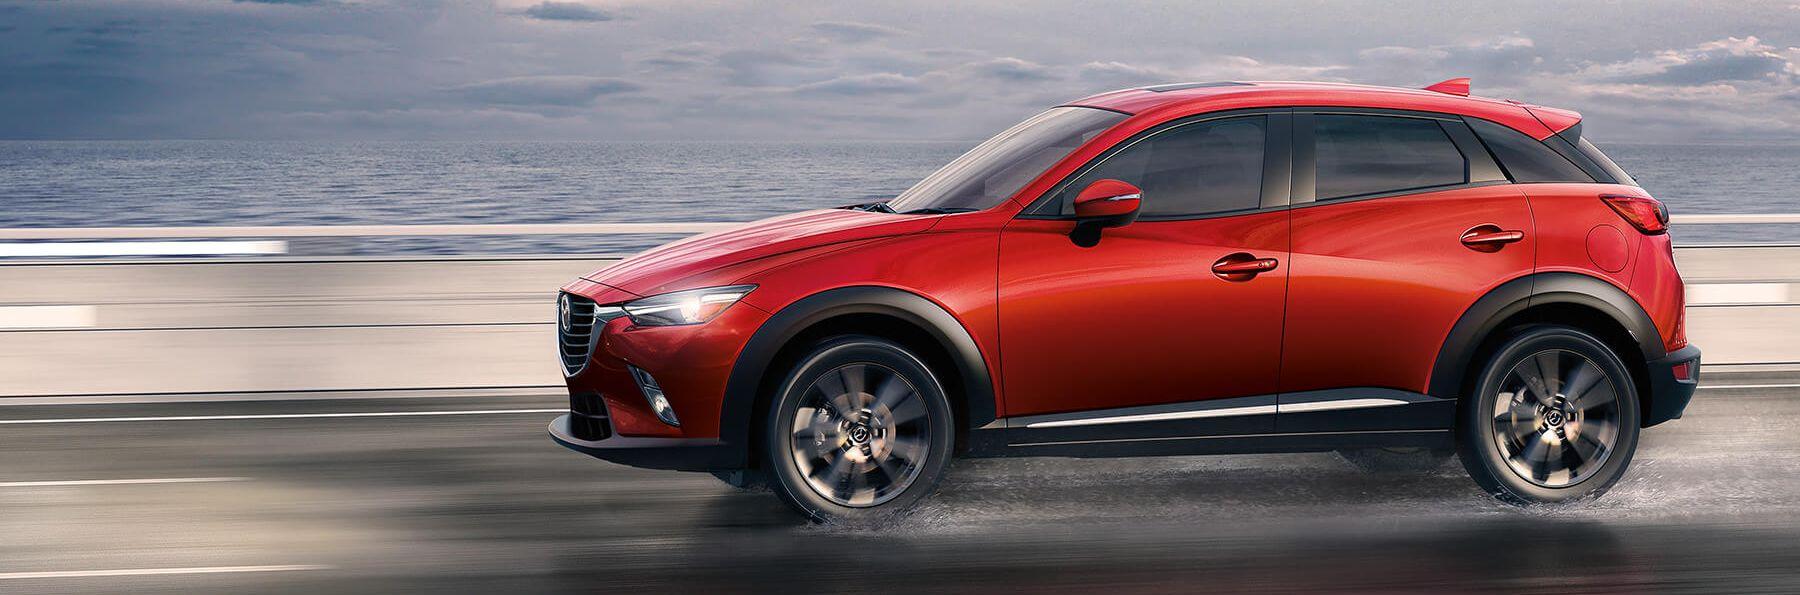 2017 Mazda CX-3 for Sale near Kalamazoo, MI - Basney Mazda